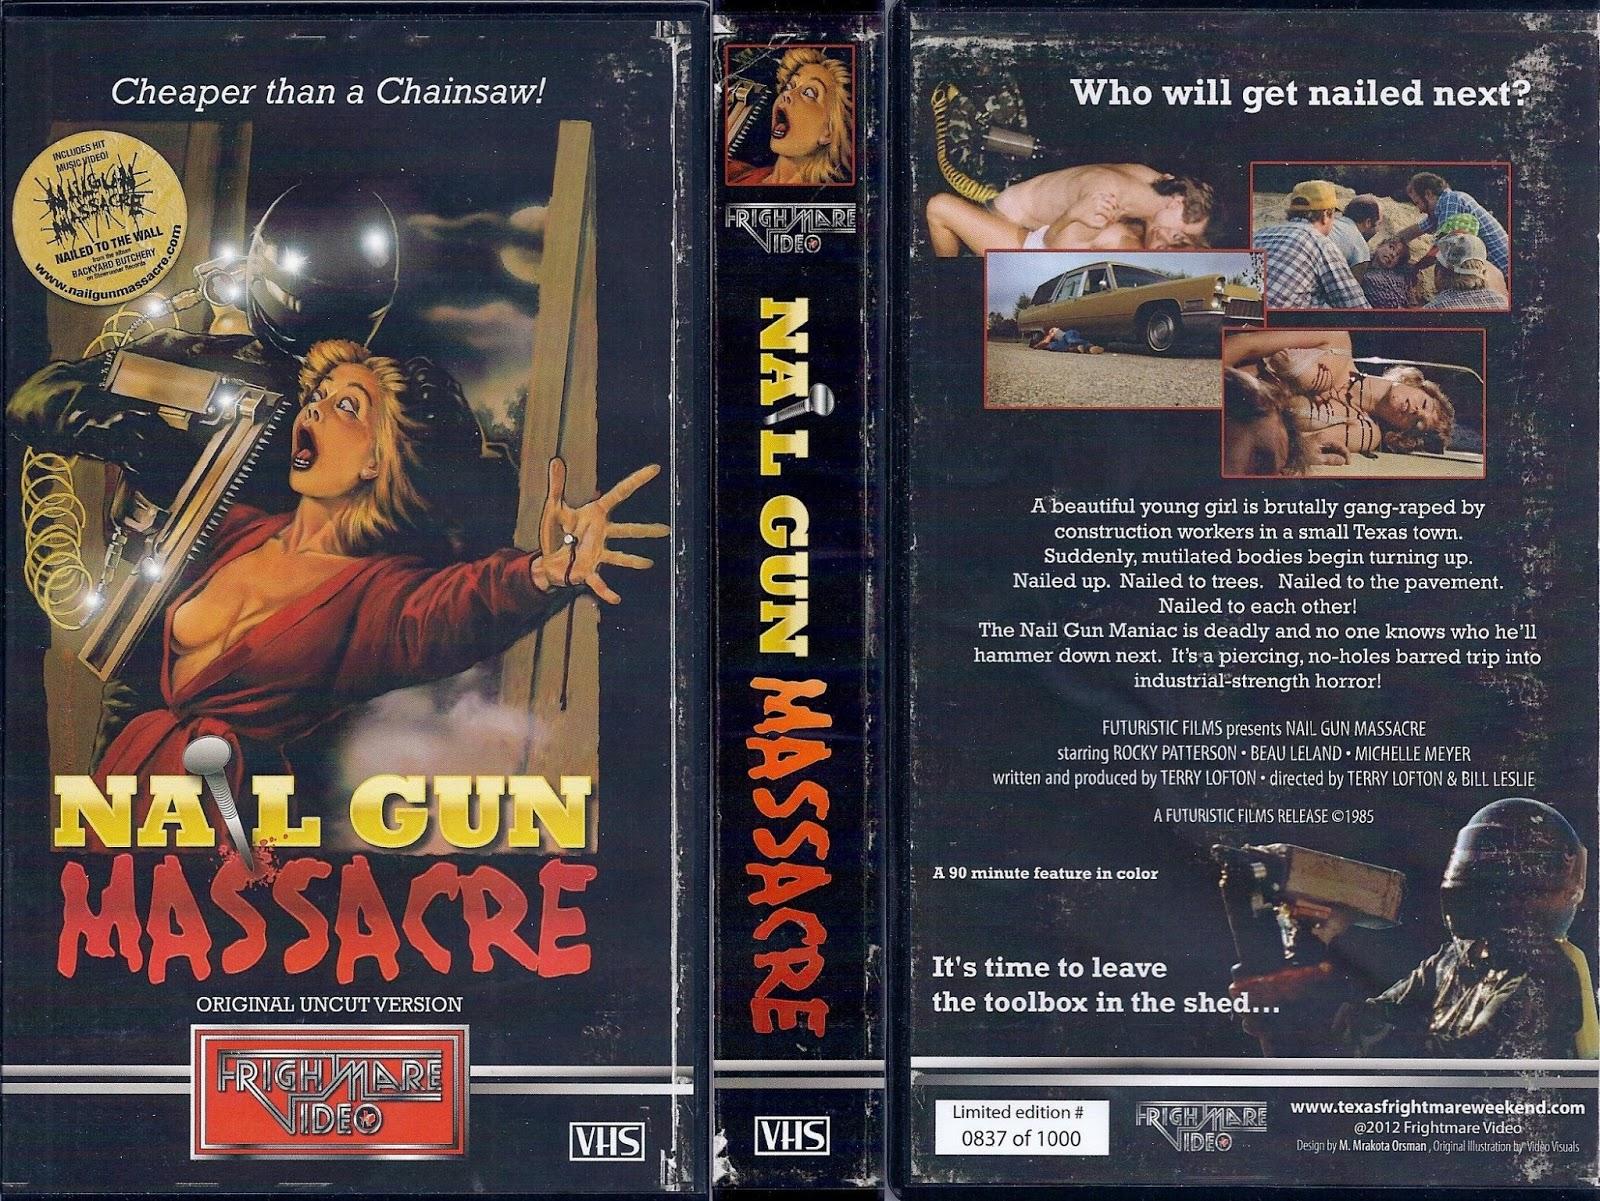 All-Star Video: Review: THE NAIL GUN MASSACRE